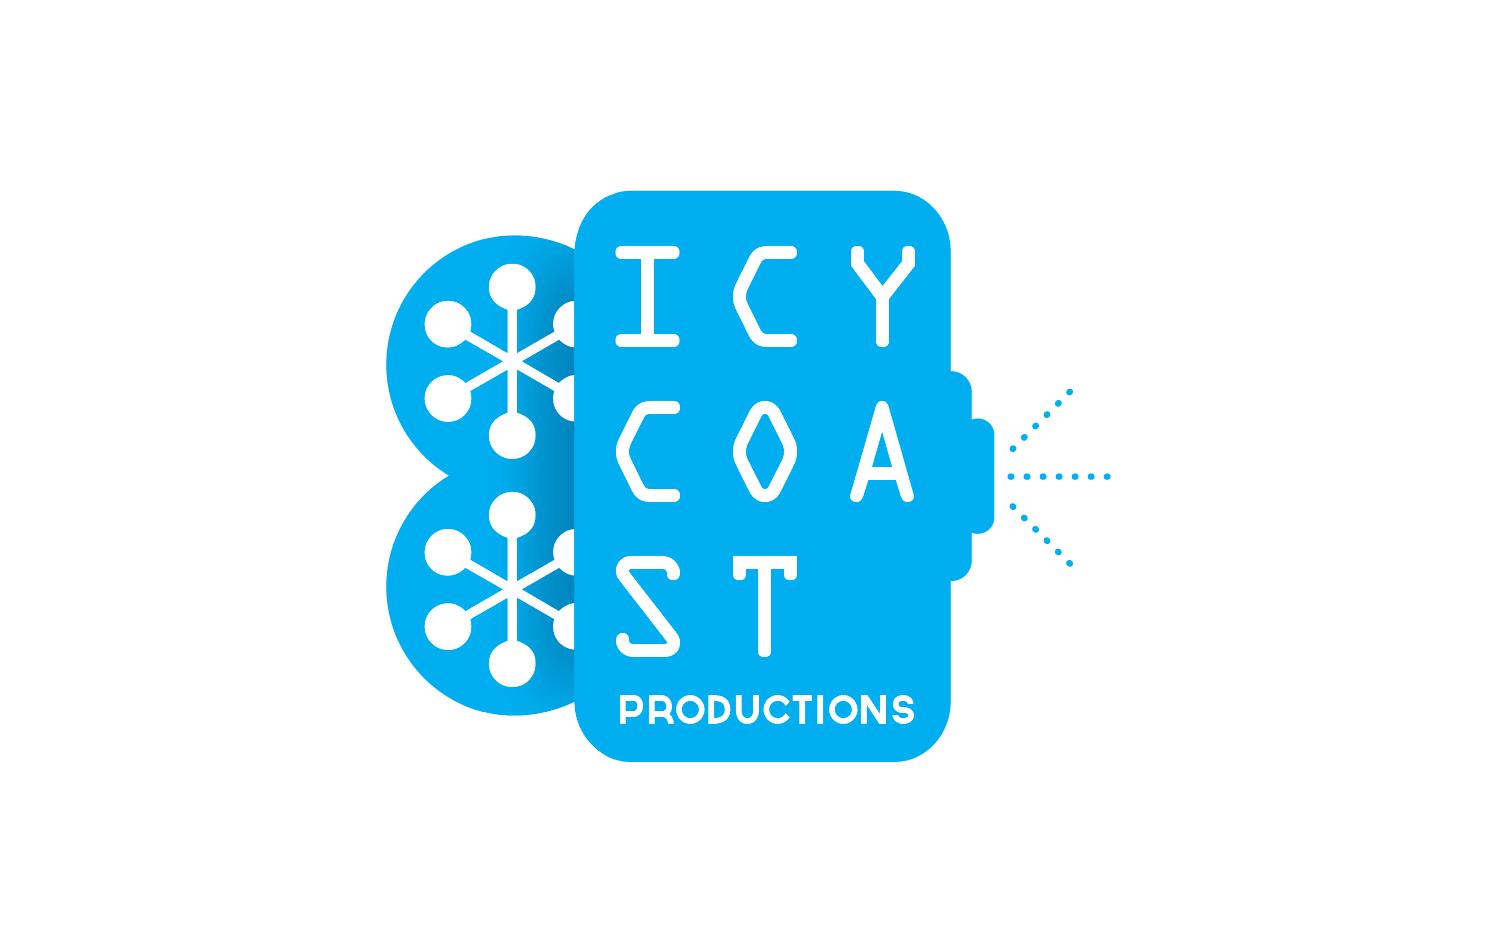 ct_icyc_logo_o.jpg